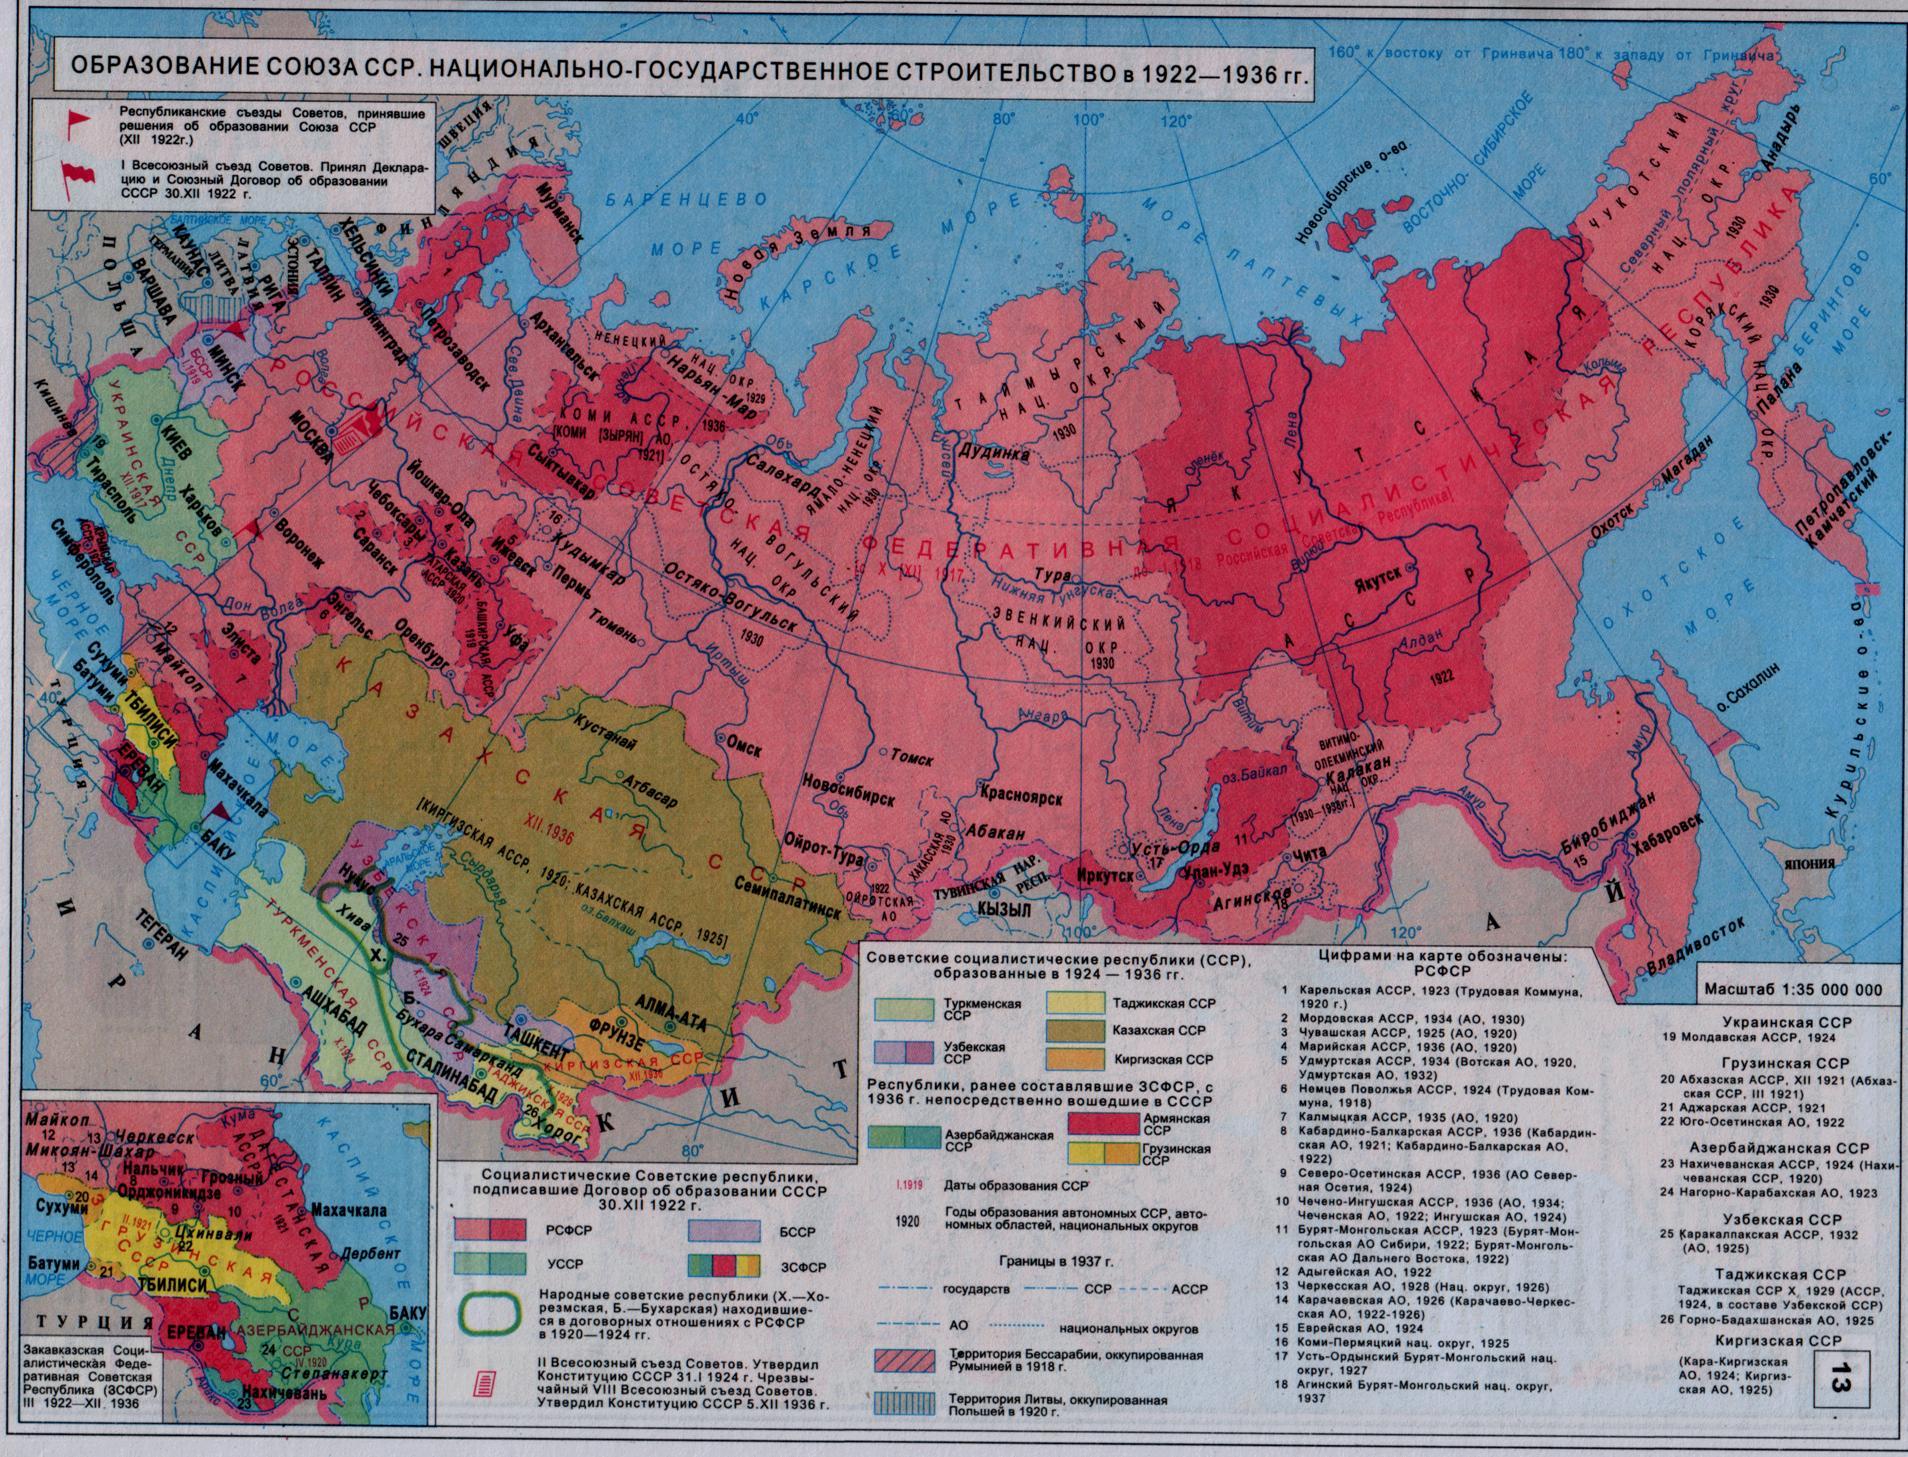 http://geschichte.rusdeutsch.ru/image/history/Glava6/%D0%A1%D0%A1%D0%A1%D0%A0%20%D0%B2%201920-%D0%B5%20-%201930-%D0%B5%20%D0%B3%D0%B3..jpg